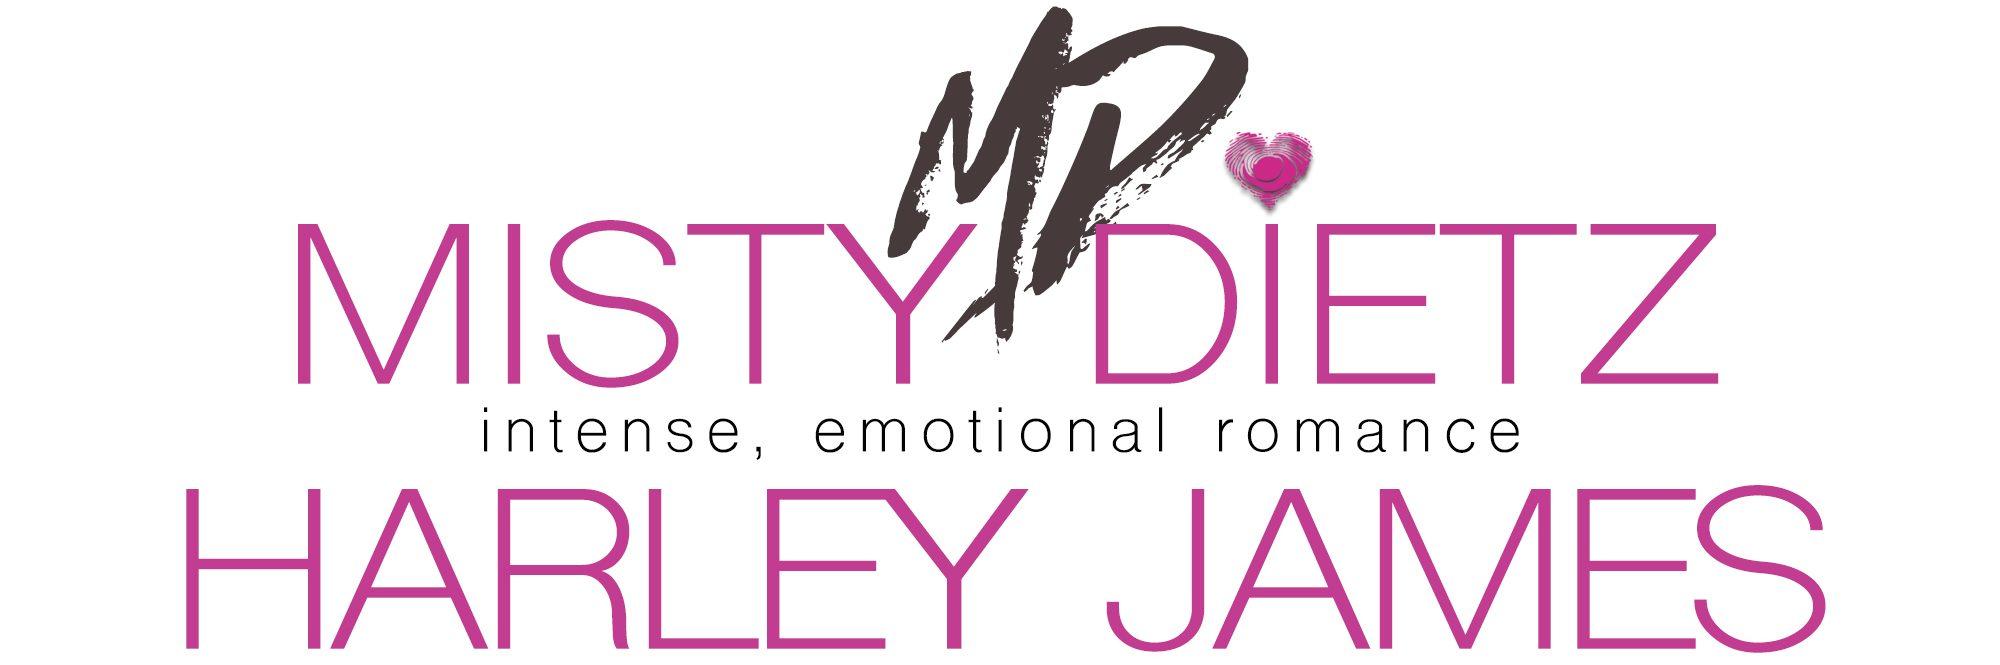 Misty Dietz + Harley James | intense, emotional romance